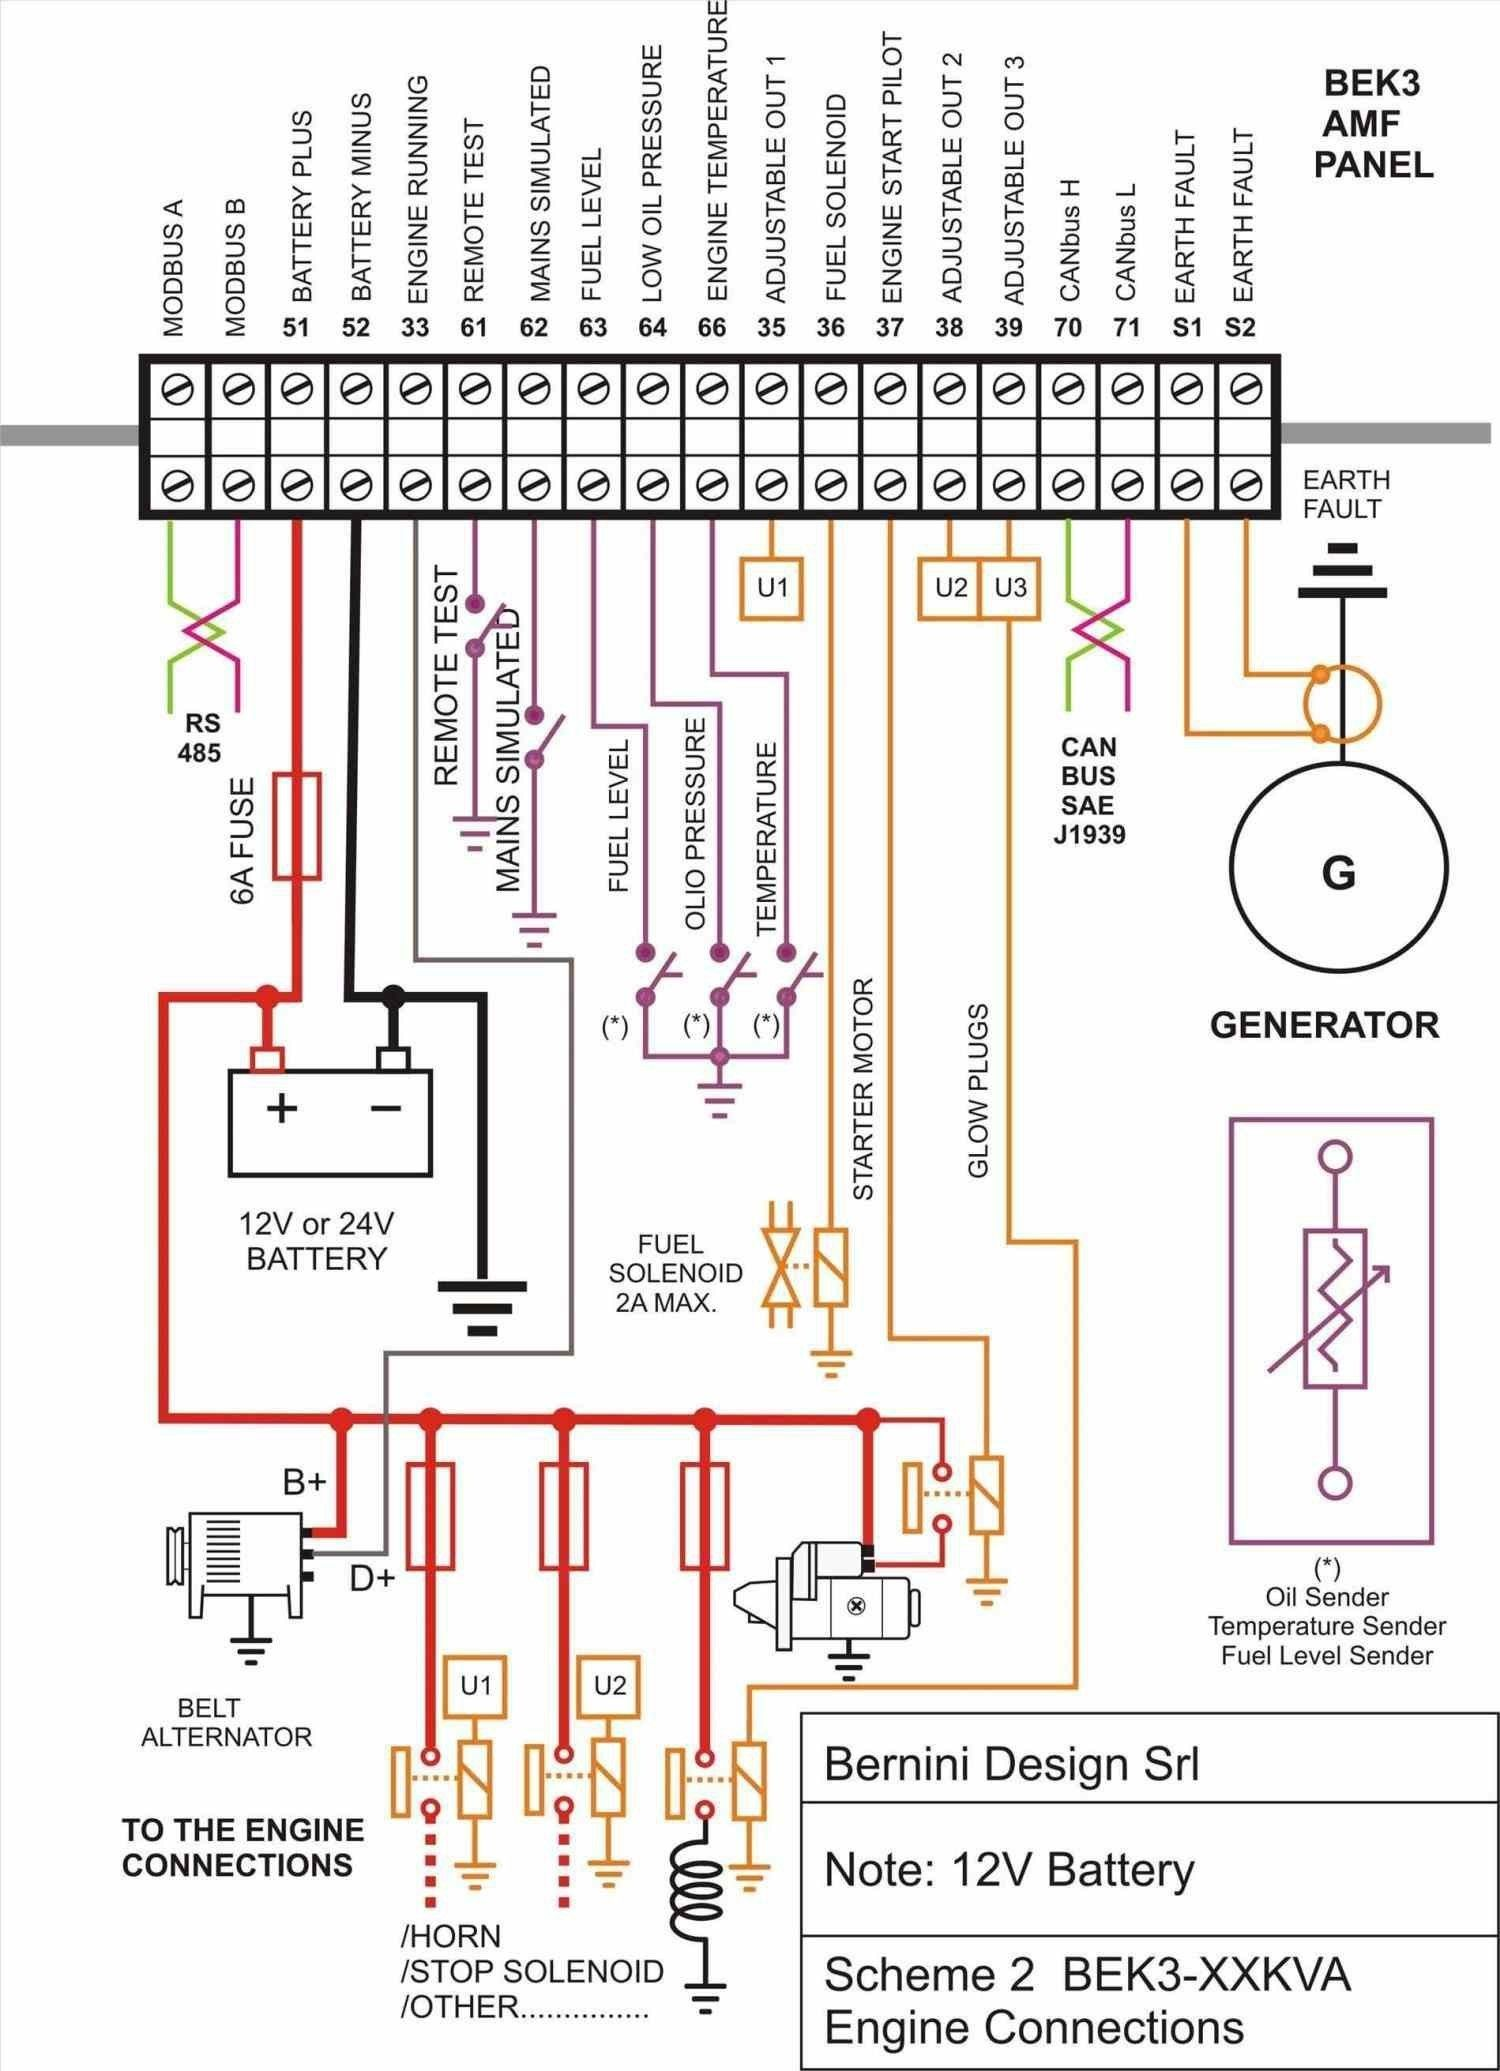 Unique Auto Wiring Terminals Diagram Wiringdiagram Diagramming Diagramm Visua Electrical Circuit Diagram Electrical Wiring Diagram Electrical Panel Wiring